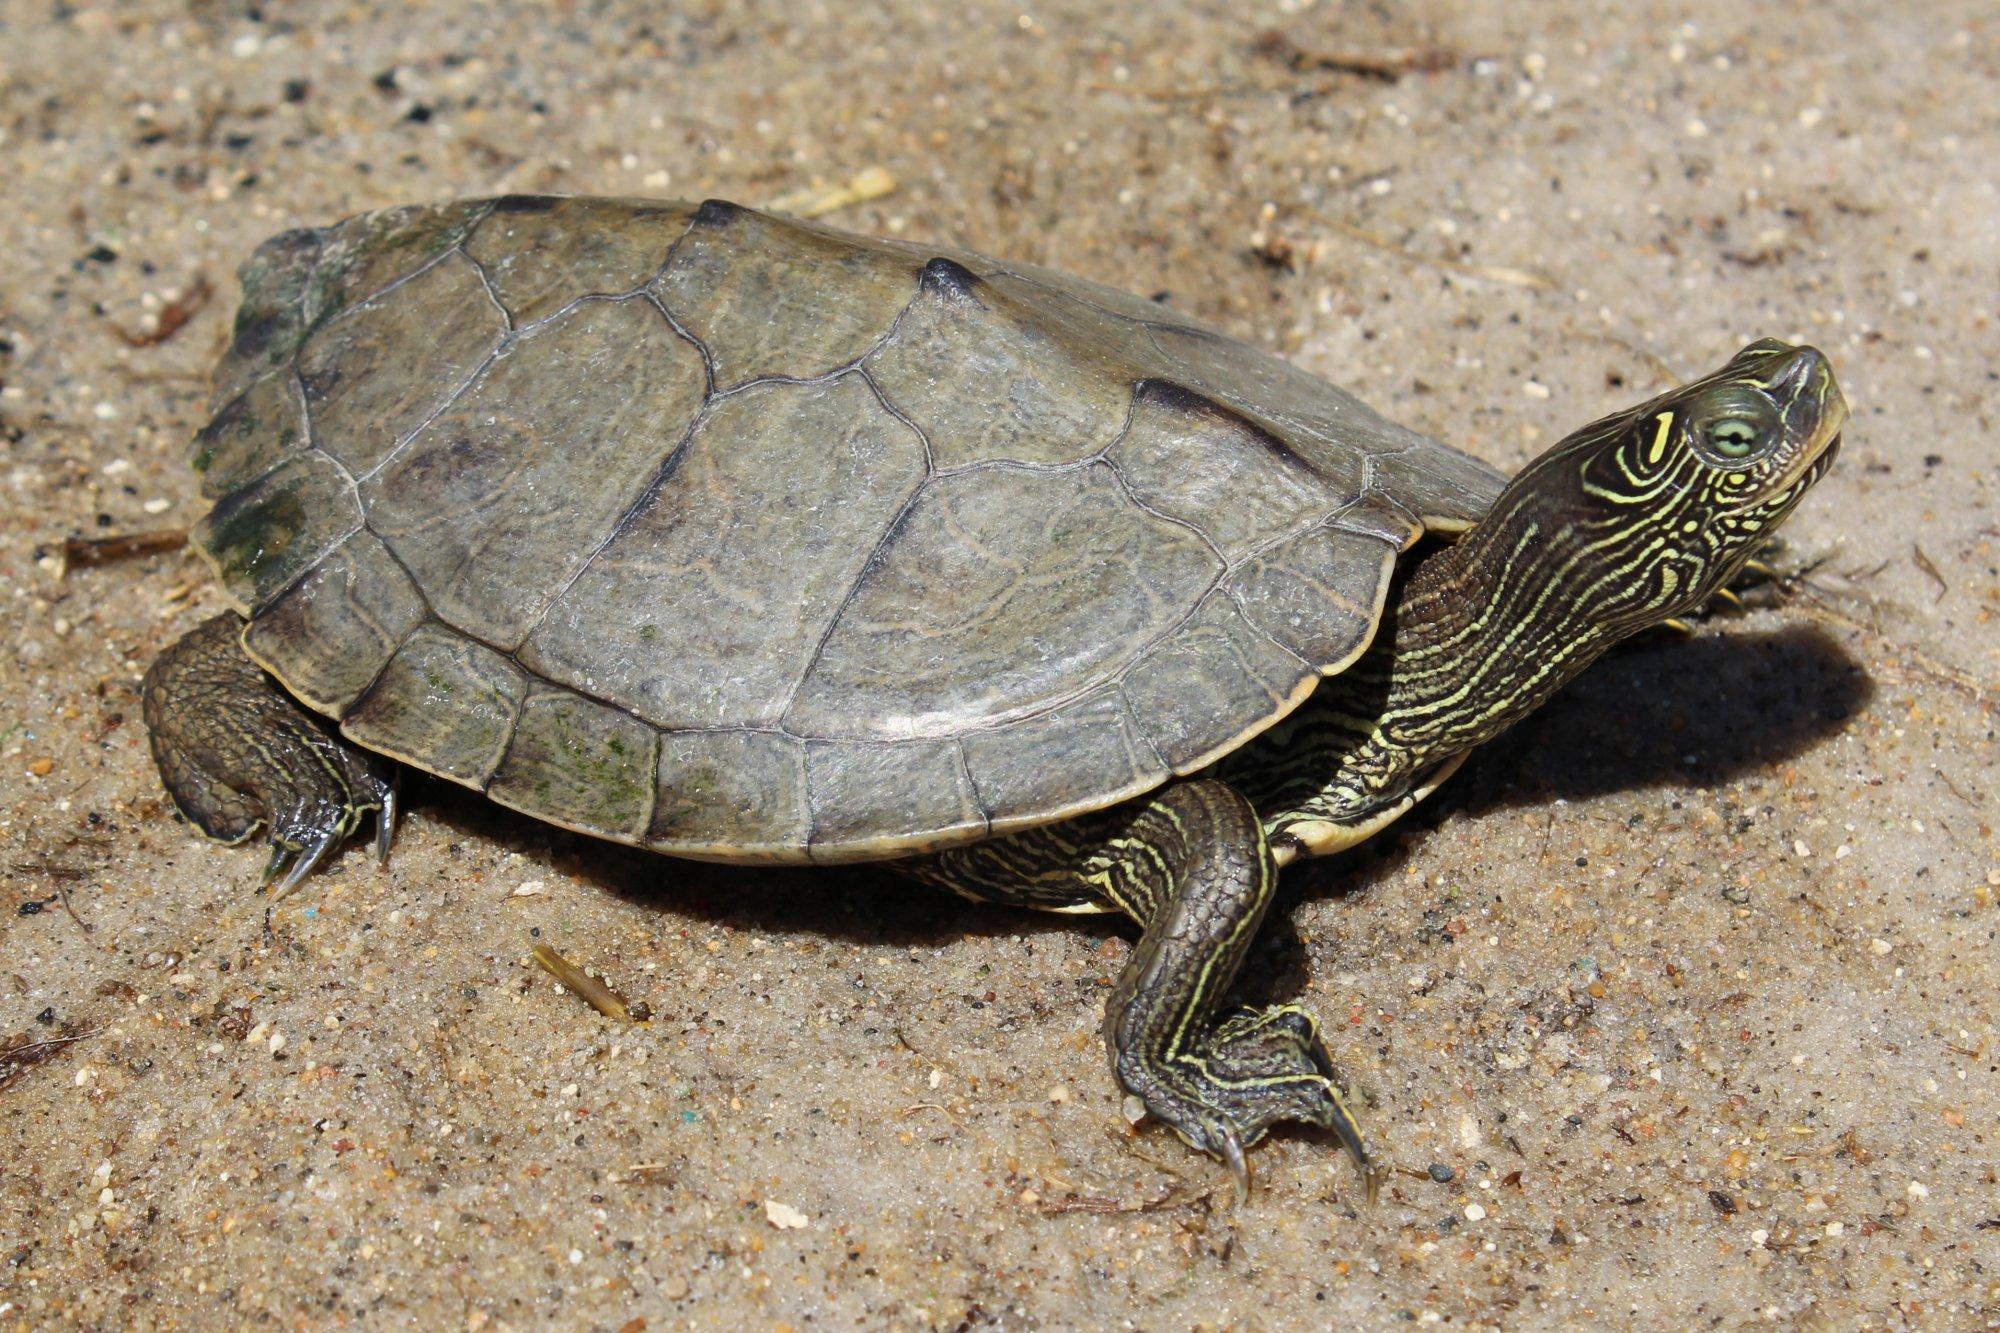 False Map Turtle False Map Turtle (Graptemys pseudogeographica)   Amphibians and